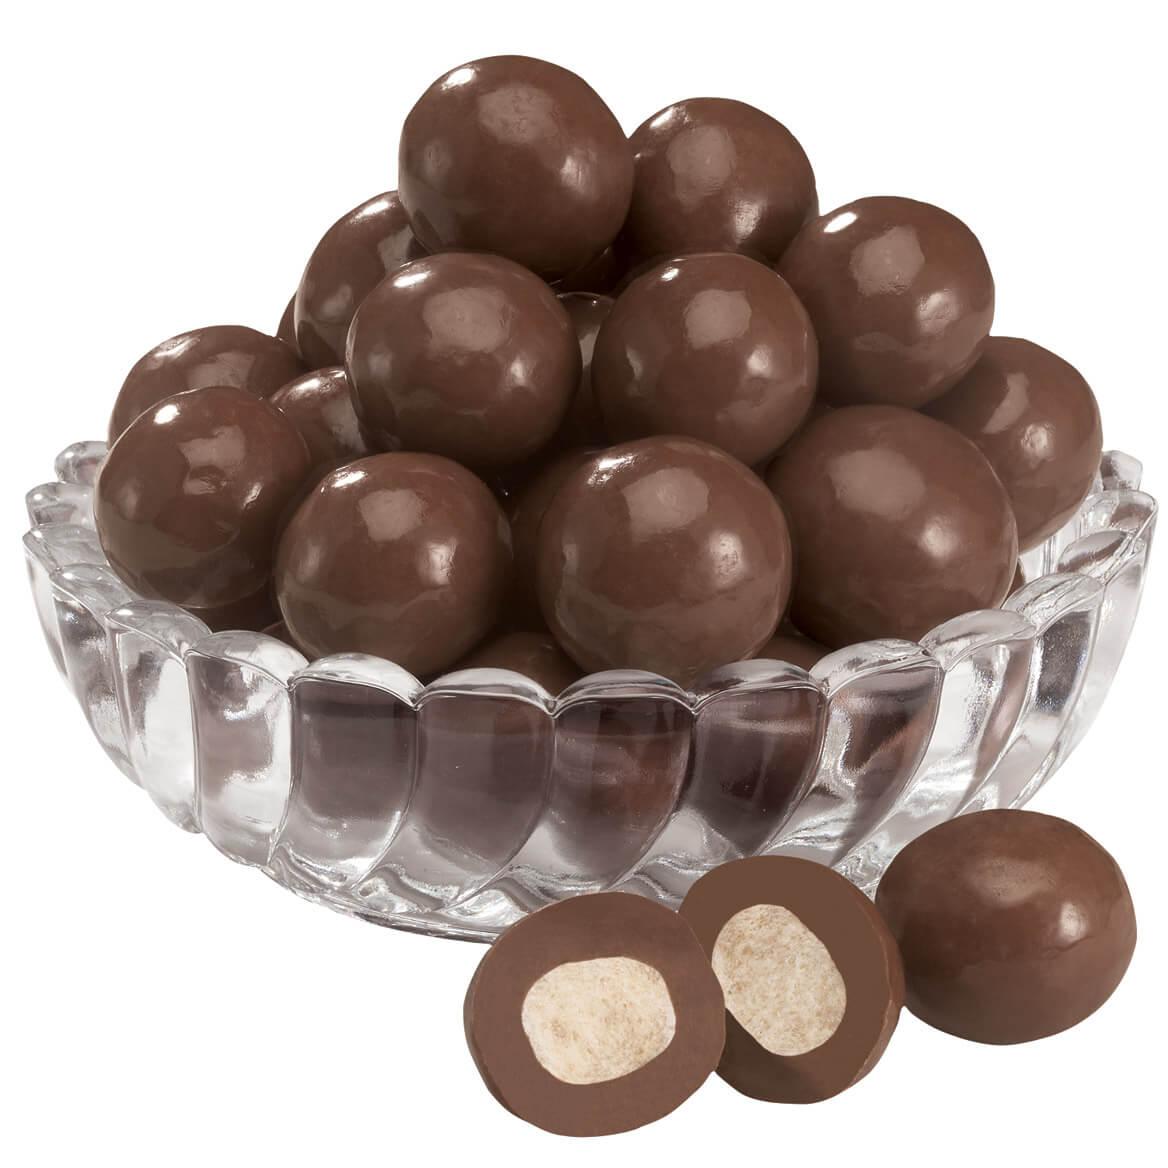 Milk Chocolate Triple Dipped Malted Milk Balls, 18 oz.-353275